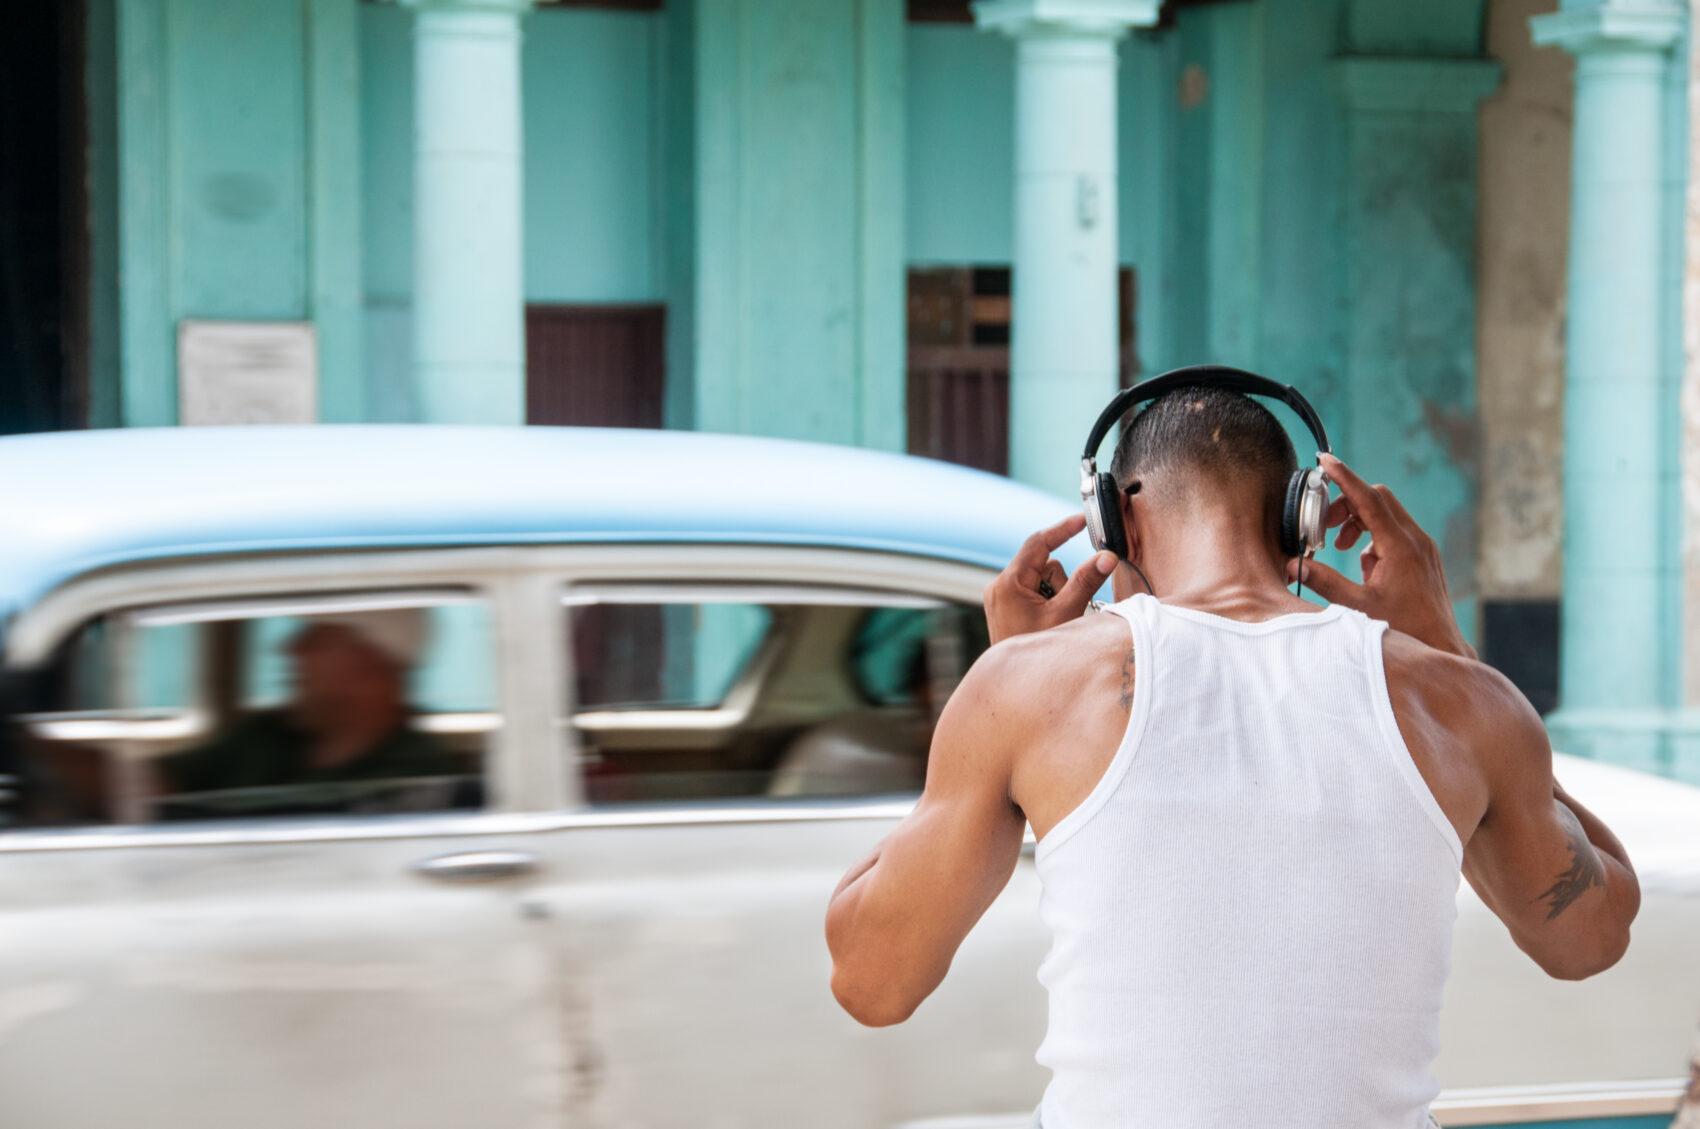 Man listening to music, Cuba